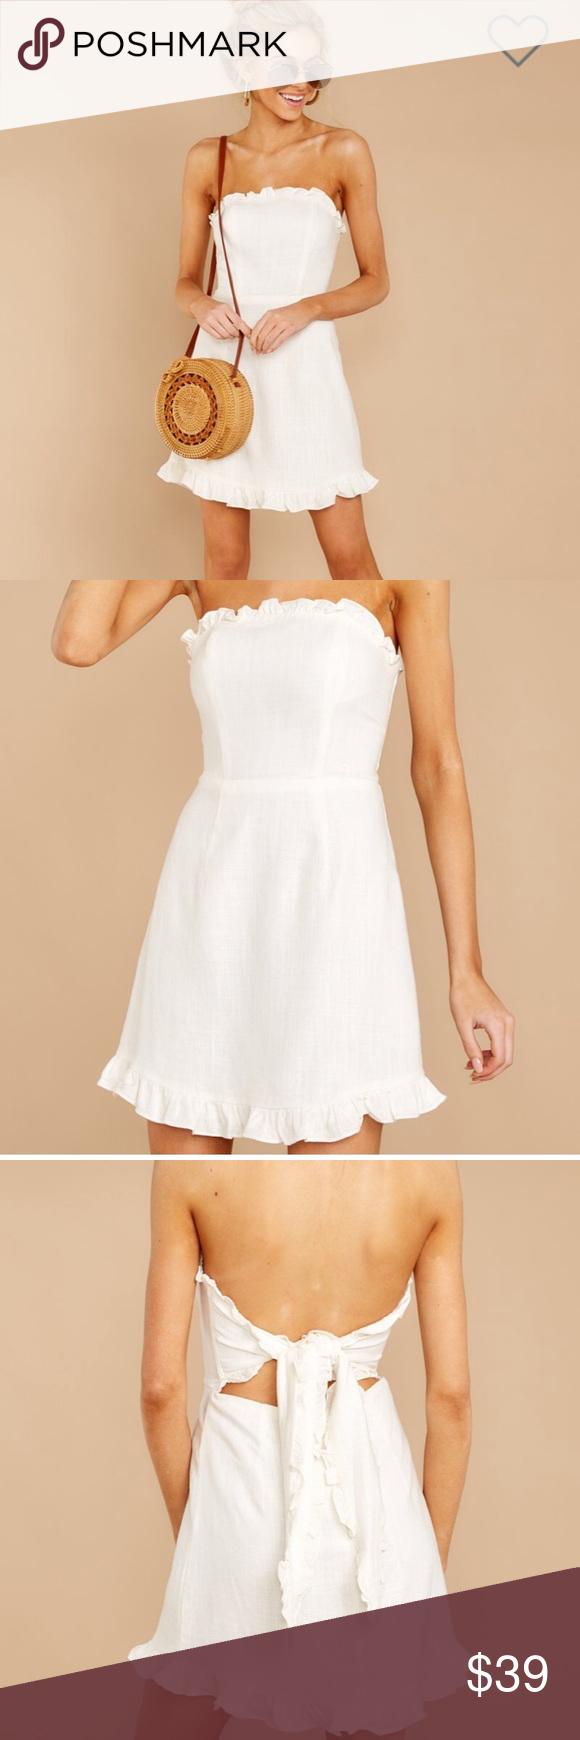 Nwt Red Dress Boutique Strapless Mini Dress Red Dress Boutique White Ruffle Dress Strapless Mini Dress [ 1740 x 580 Pixel ]